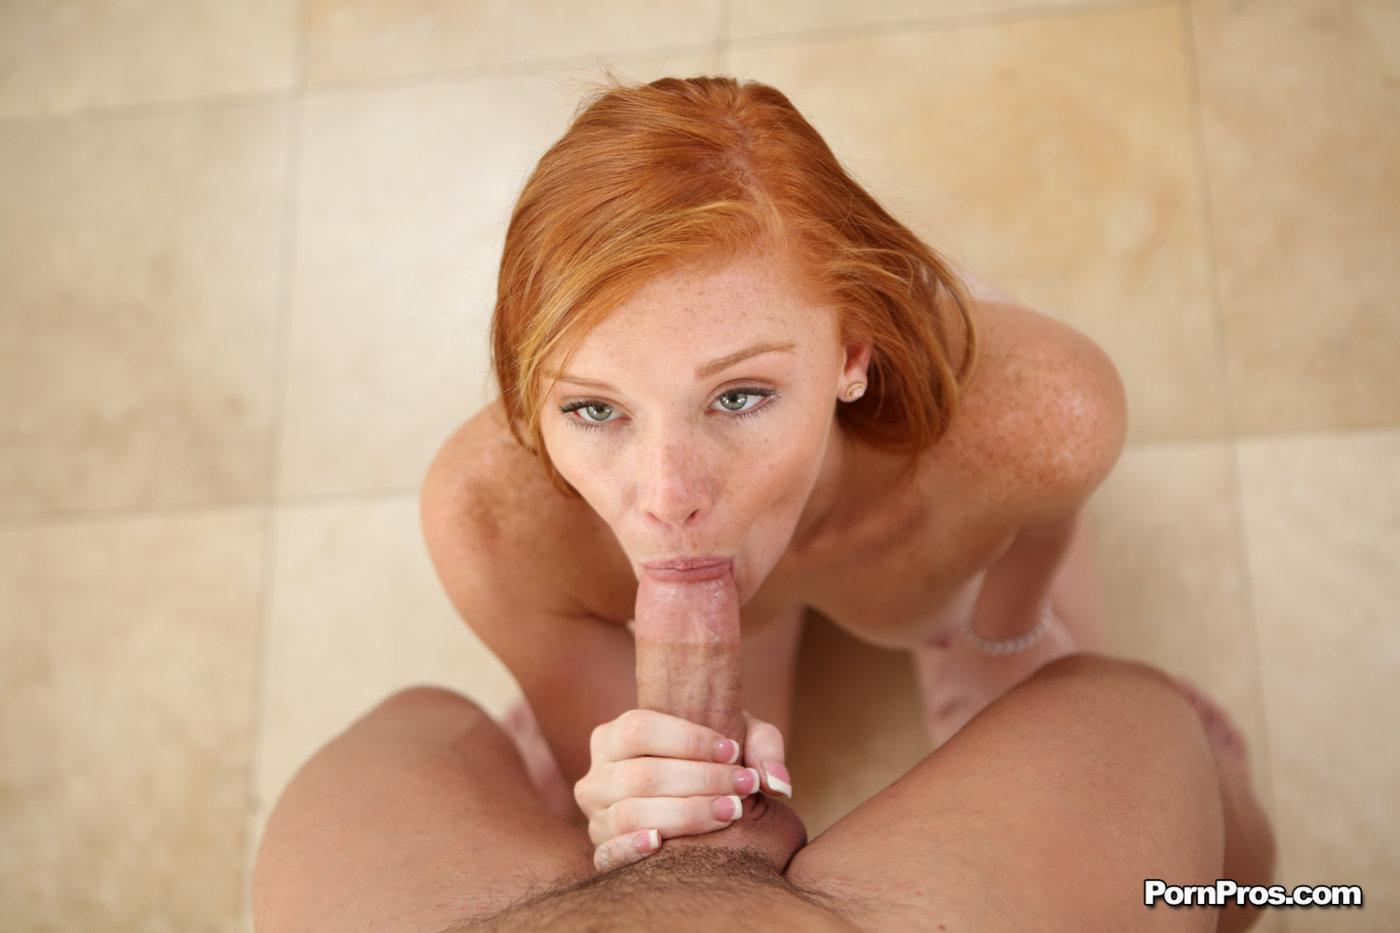 porno-otsos-rizhaya